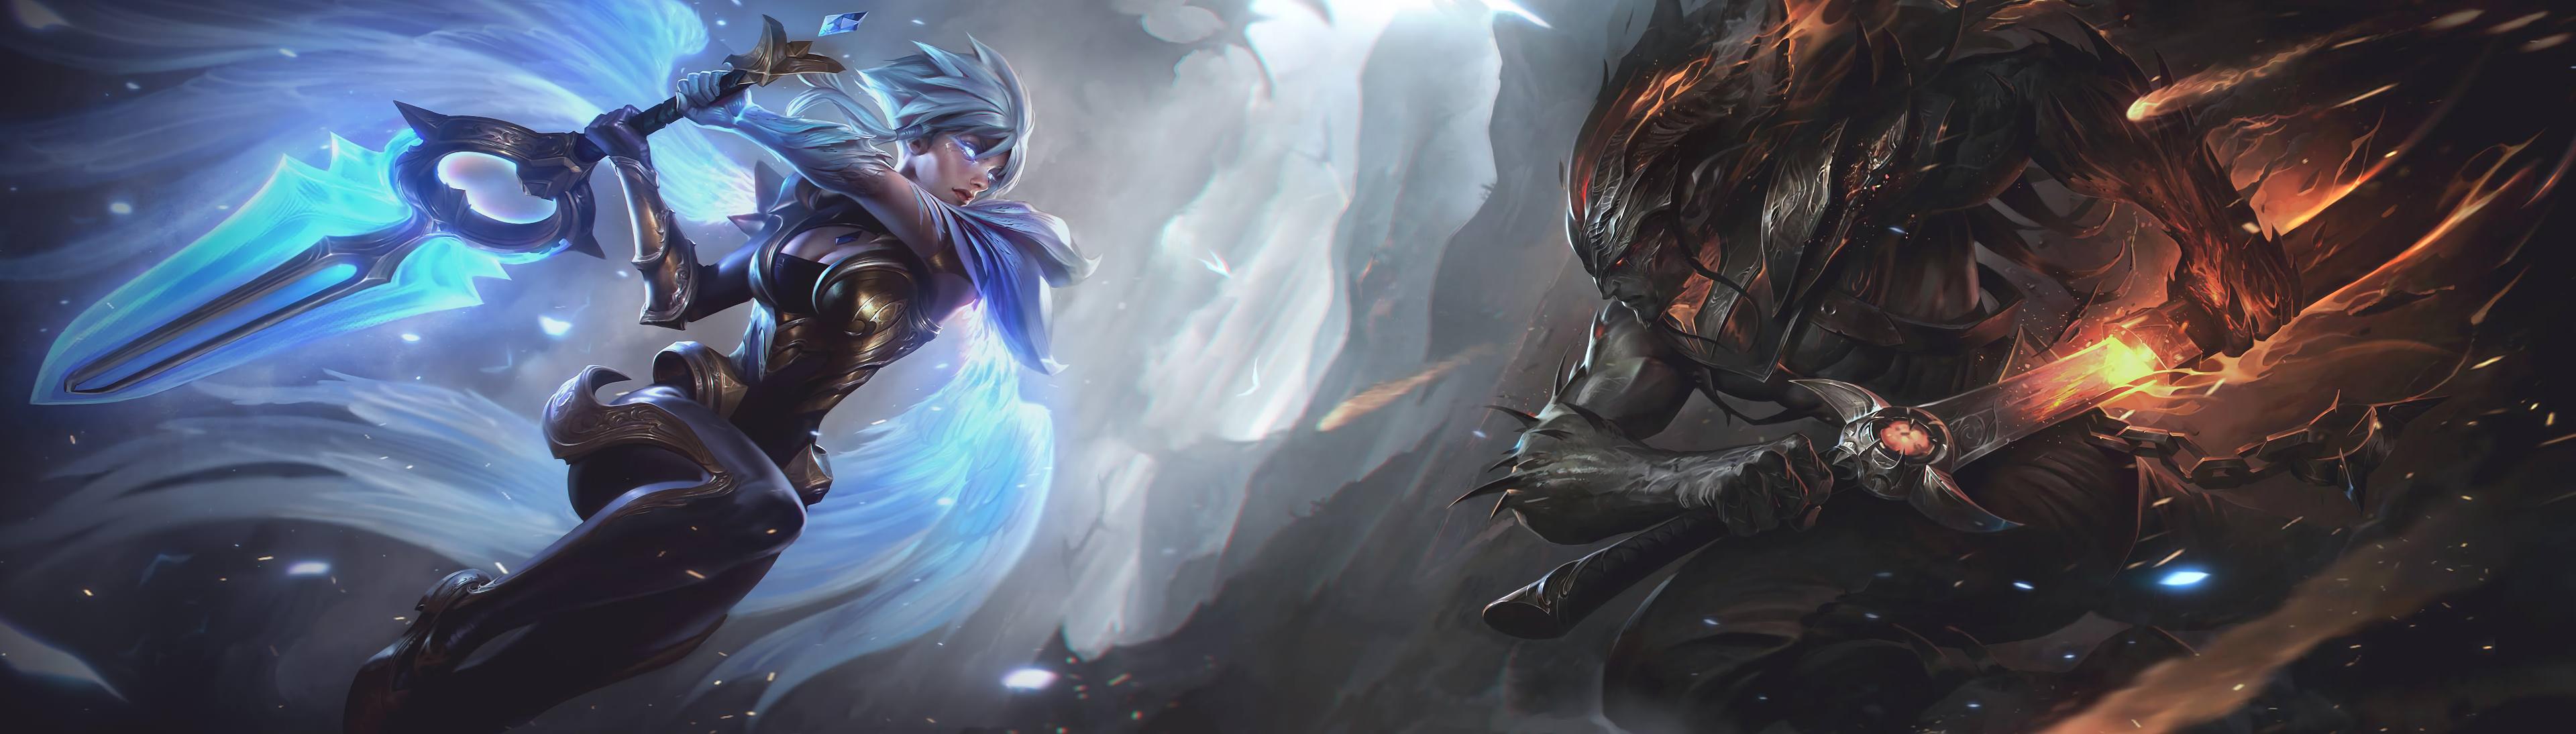 League Of Legends Championship Riven Wallpaper Hd Is